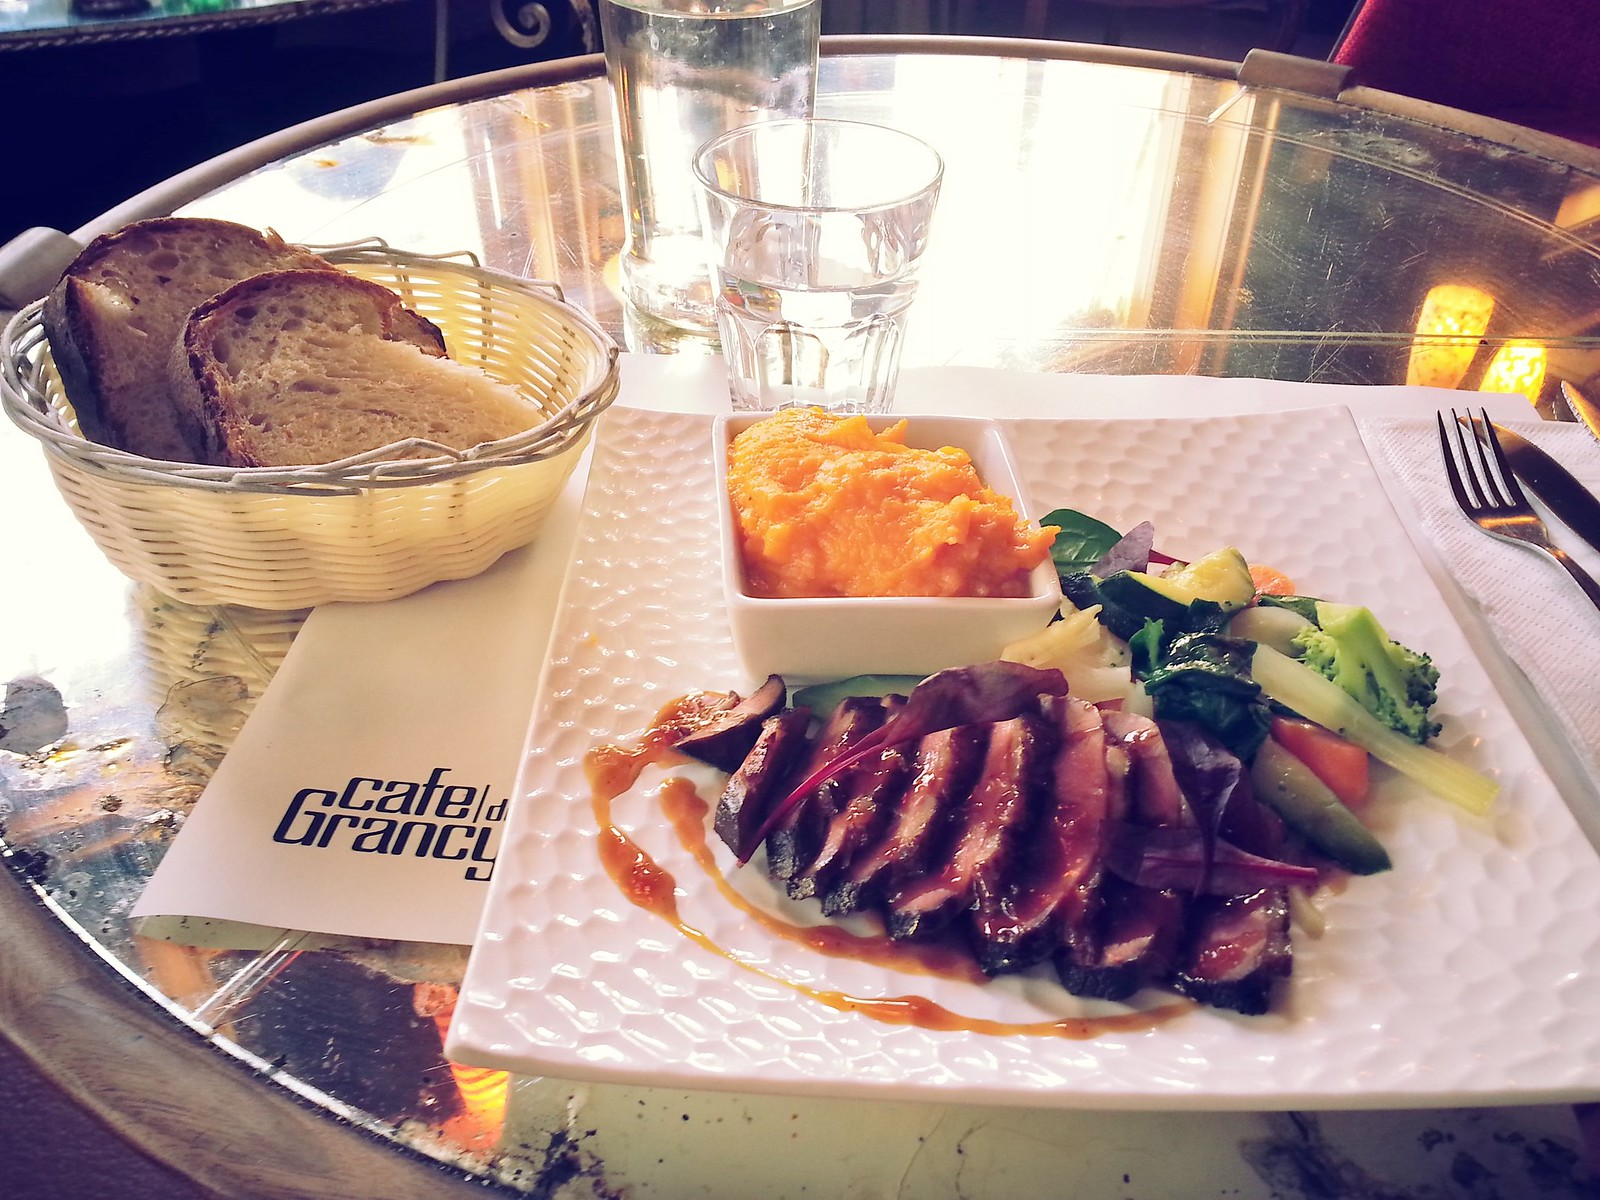 16-01-29 (Lausanne) Lunch at Café de Grancy (duck with sweet potato purée and vegetables). 29 Swiss francs-incredible!